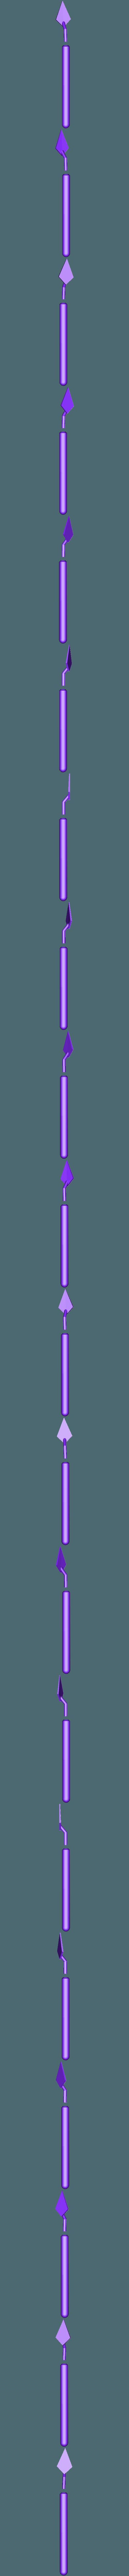 plumaspatula.stl Download free STL file Pen - Palette Knife • Model to 3D print, FenixYeshua